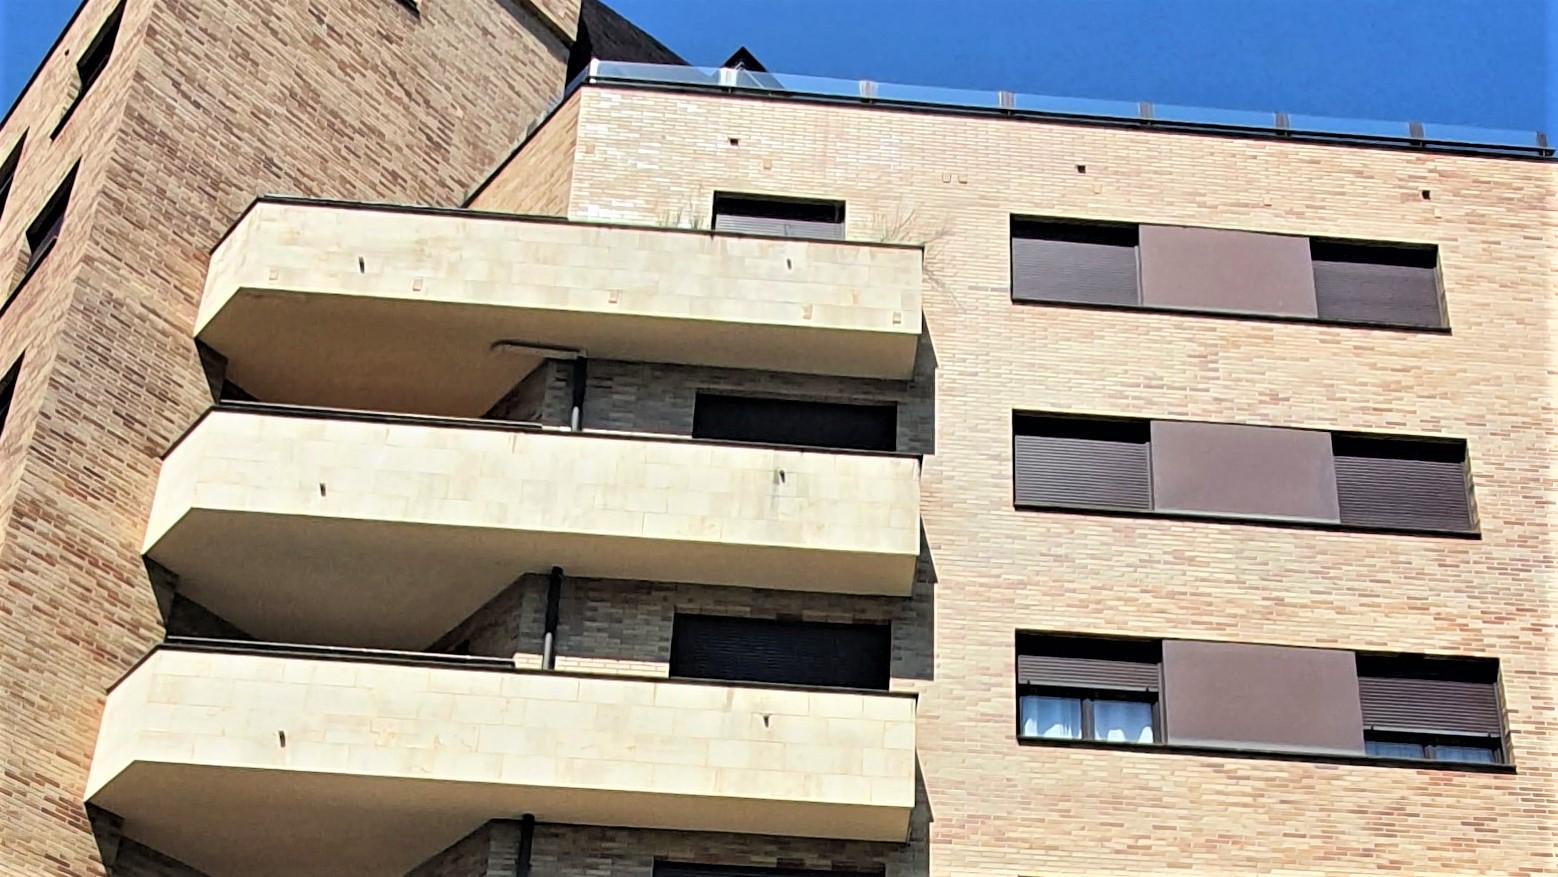 Ardis-grupo-inmobiliario-montecerrao-oviedoArdis Grupo Inmobiliario